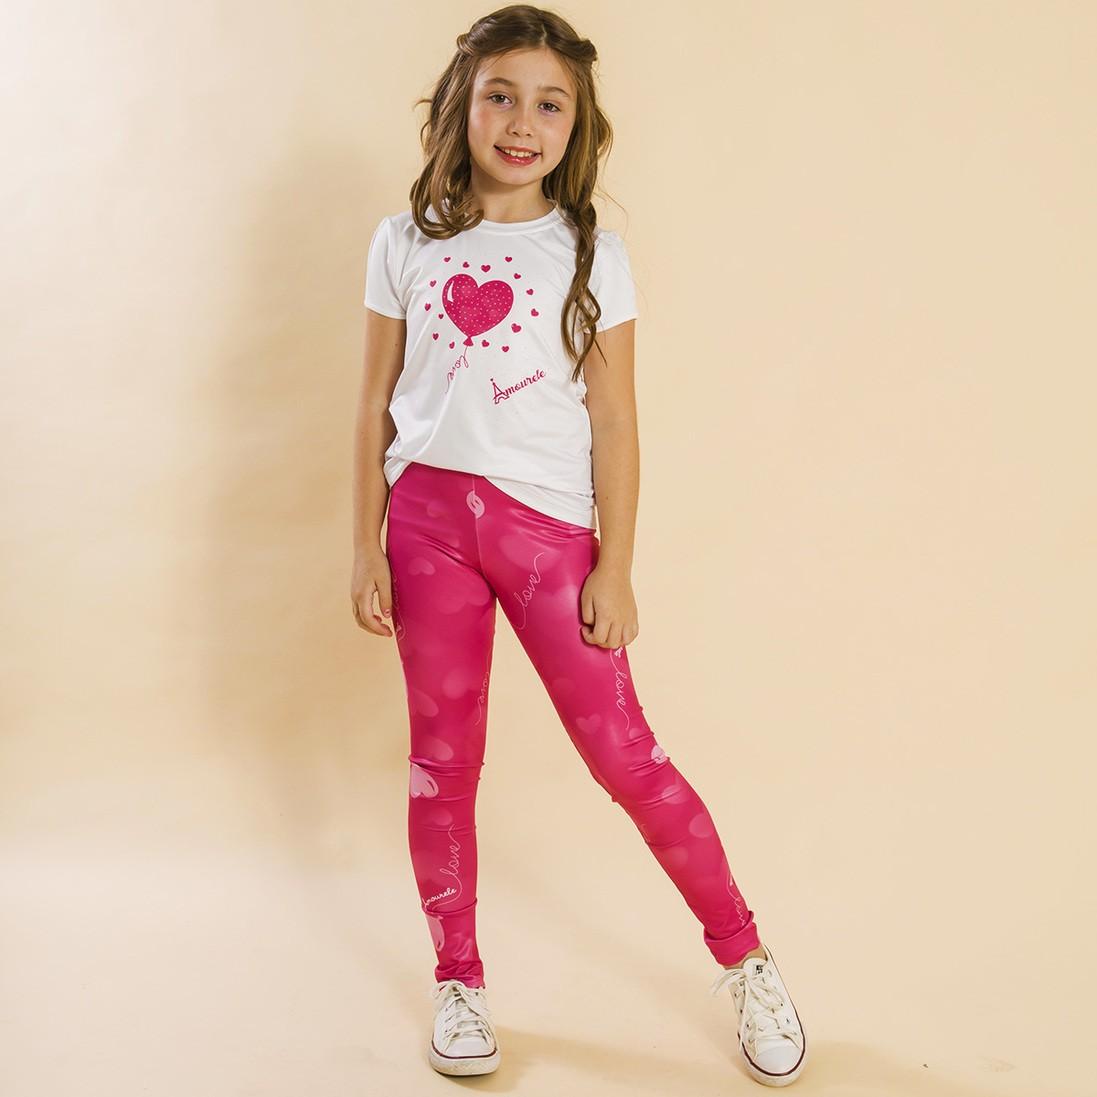 Combo 2 Peças - Conjunto Legging Comprida + Jaqueta Balão Rosa